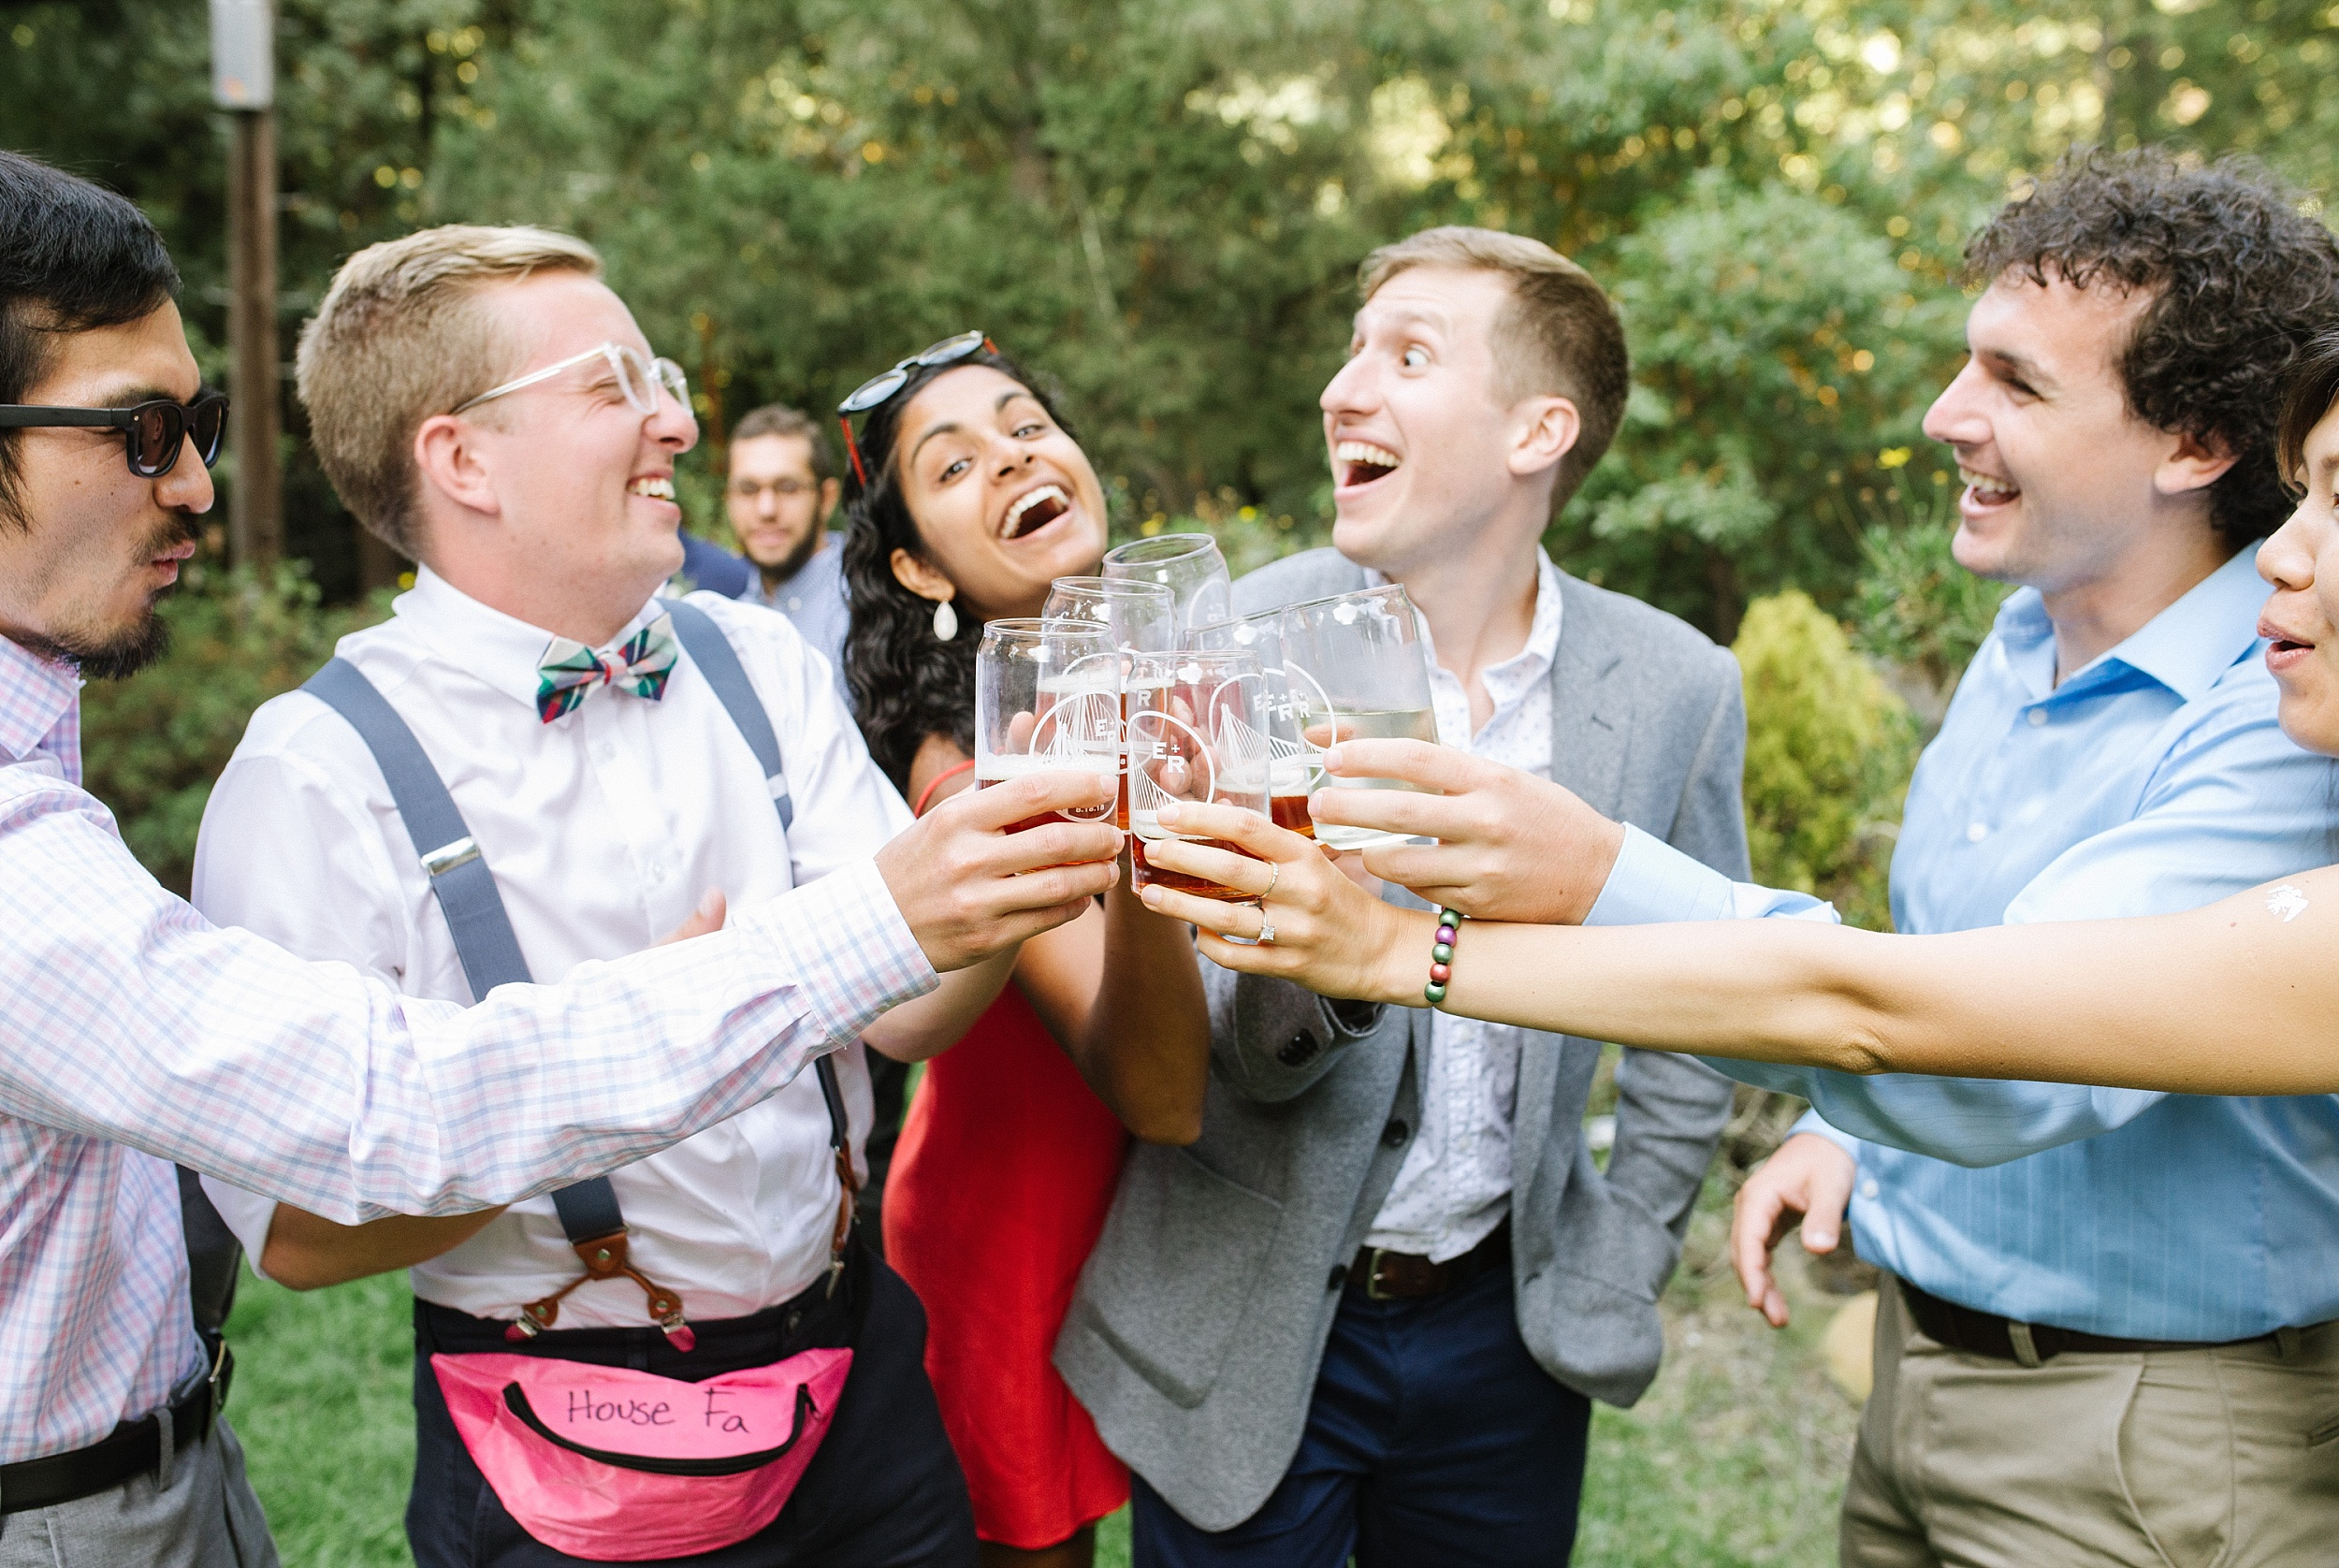 Amphitheatre-of-the-Redwoods-wedding-erikariley_chelsea-dier-photography_0033.jpg